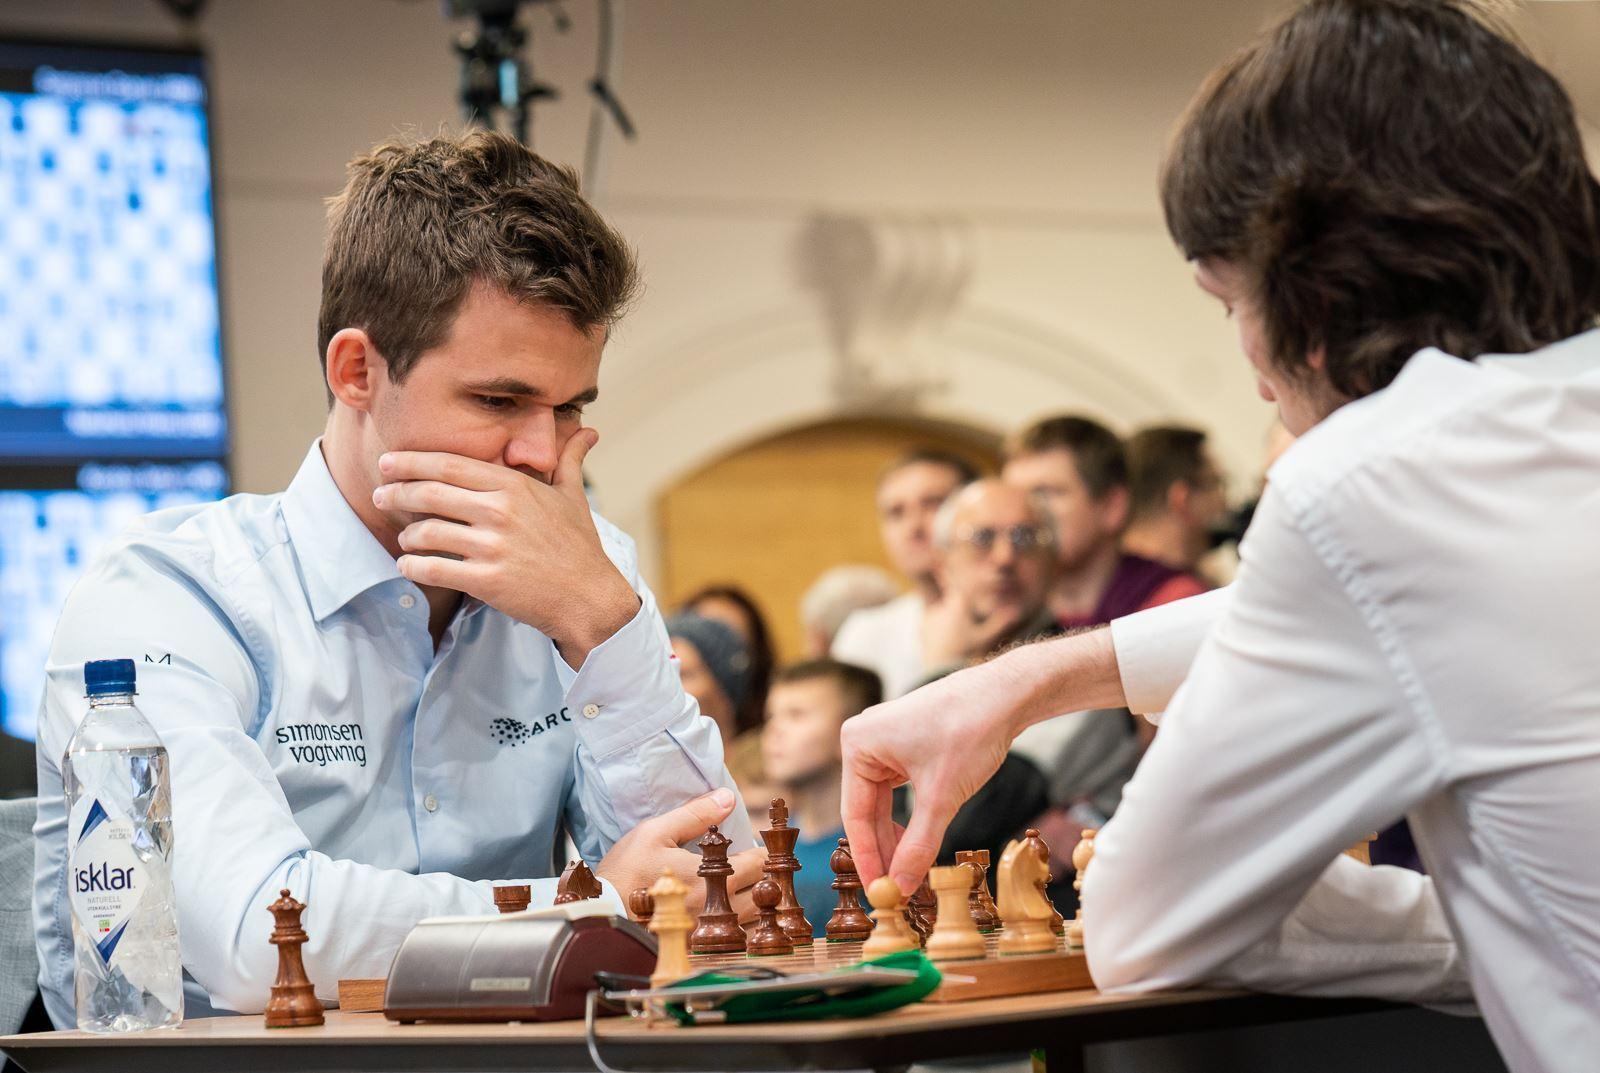 dubov daniil and ju wenjun won fide world rapid chess